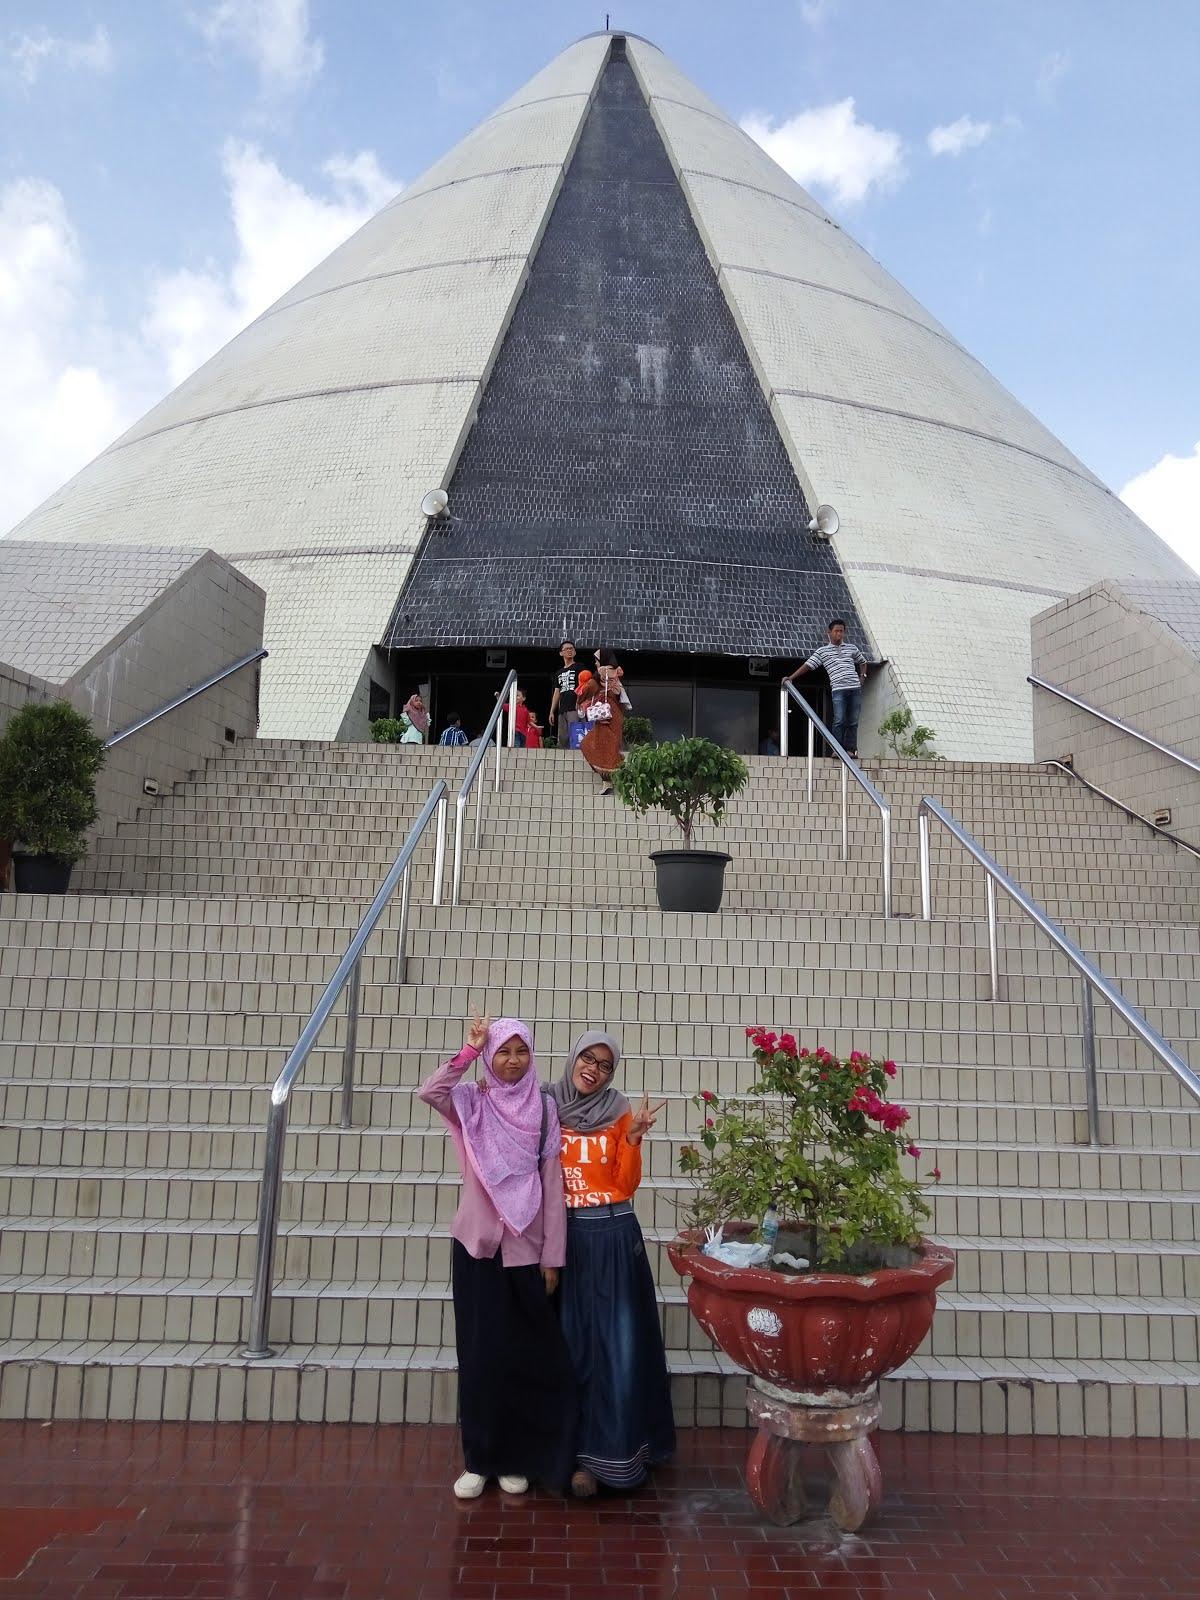 Monumen Jogja Kembali, Yogyakarta, 12/16